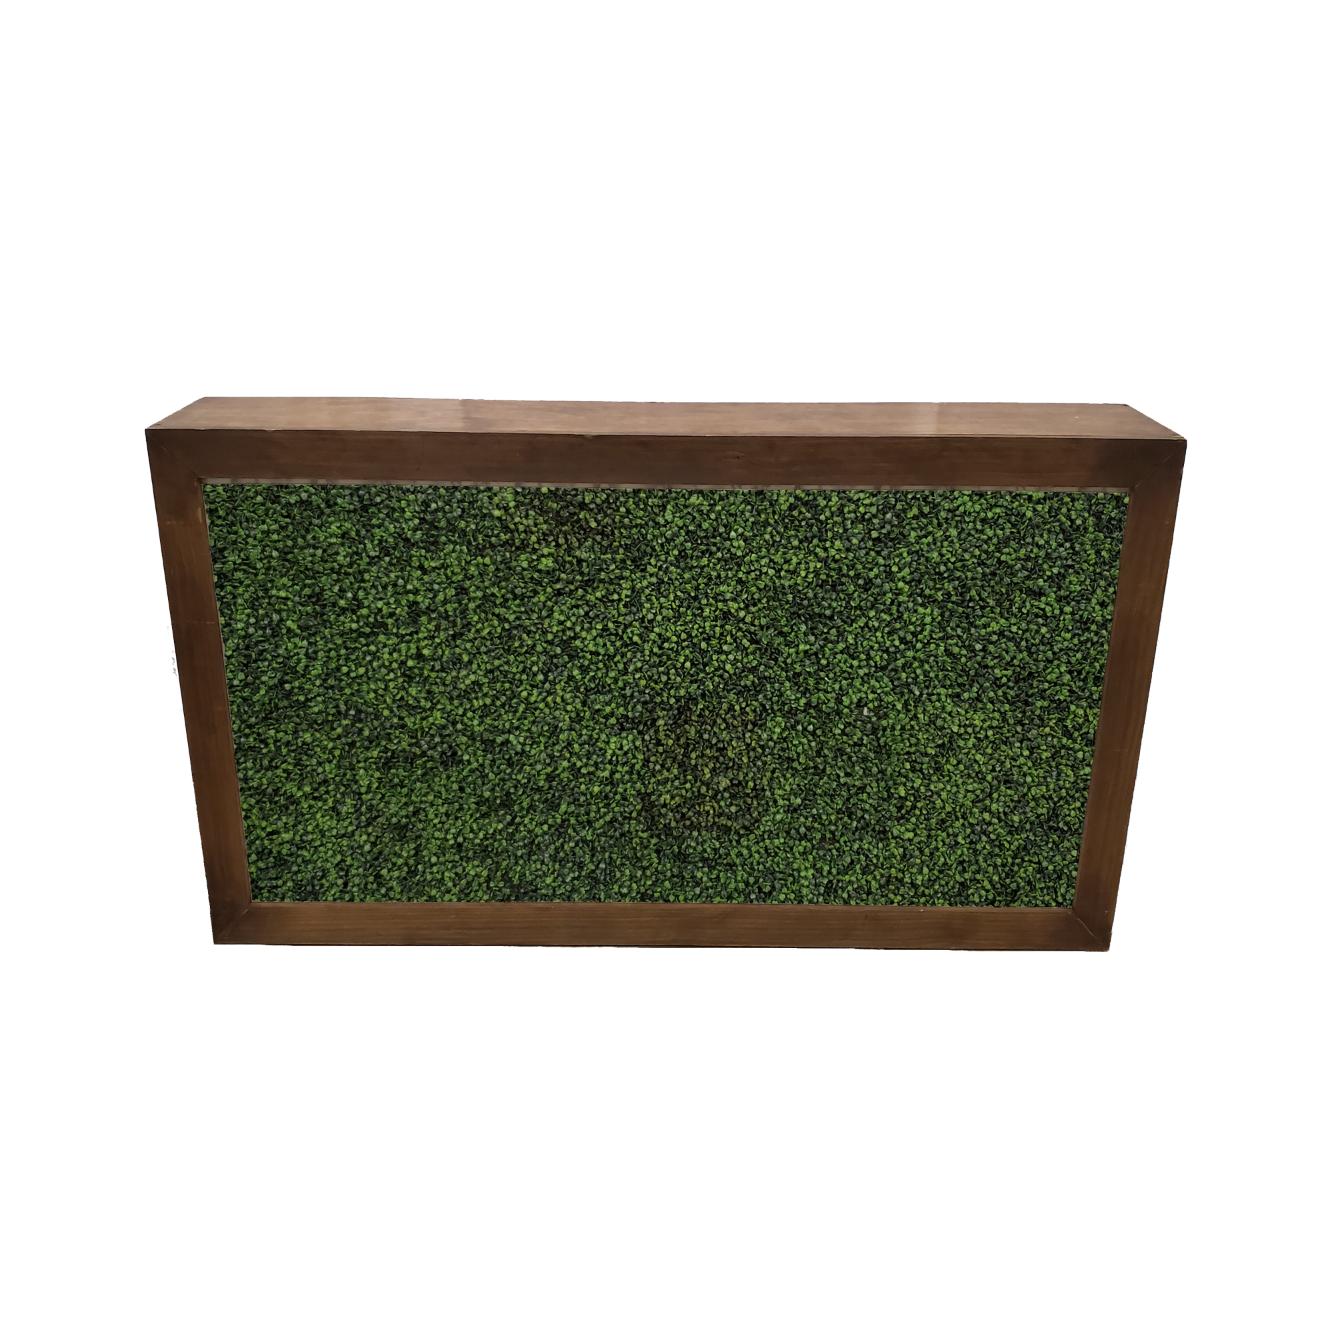 Wood Frame Bar/Hedge Insert $200